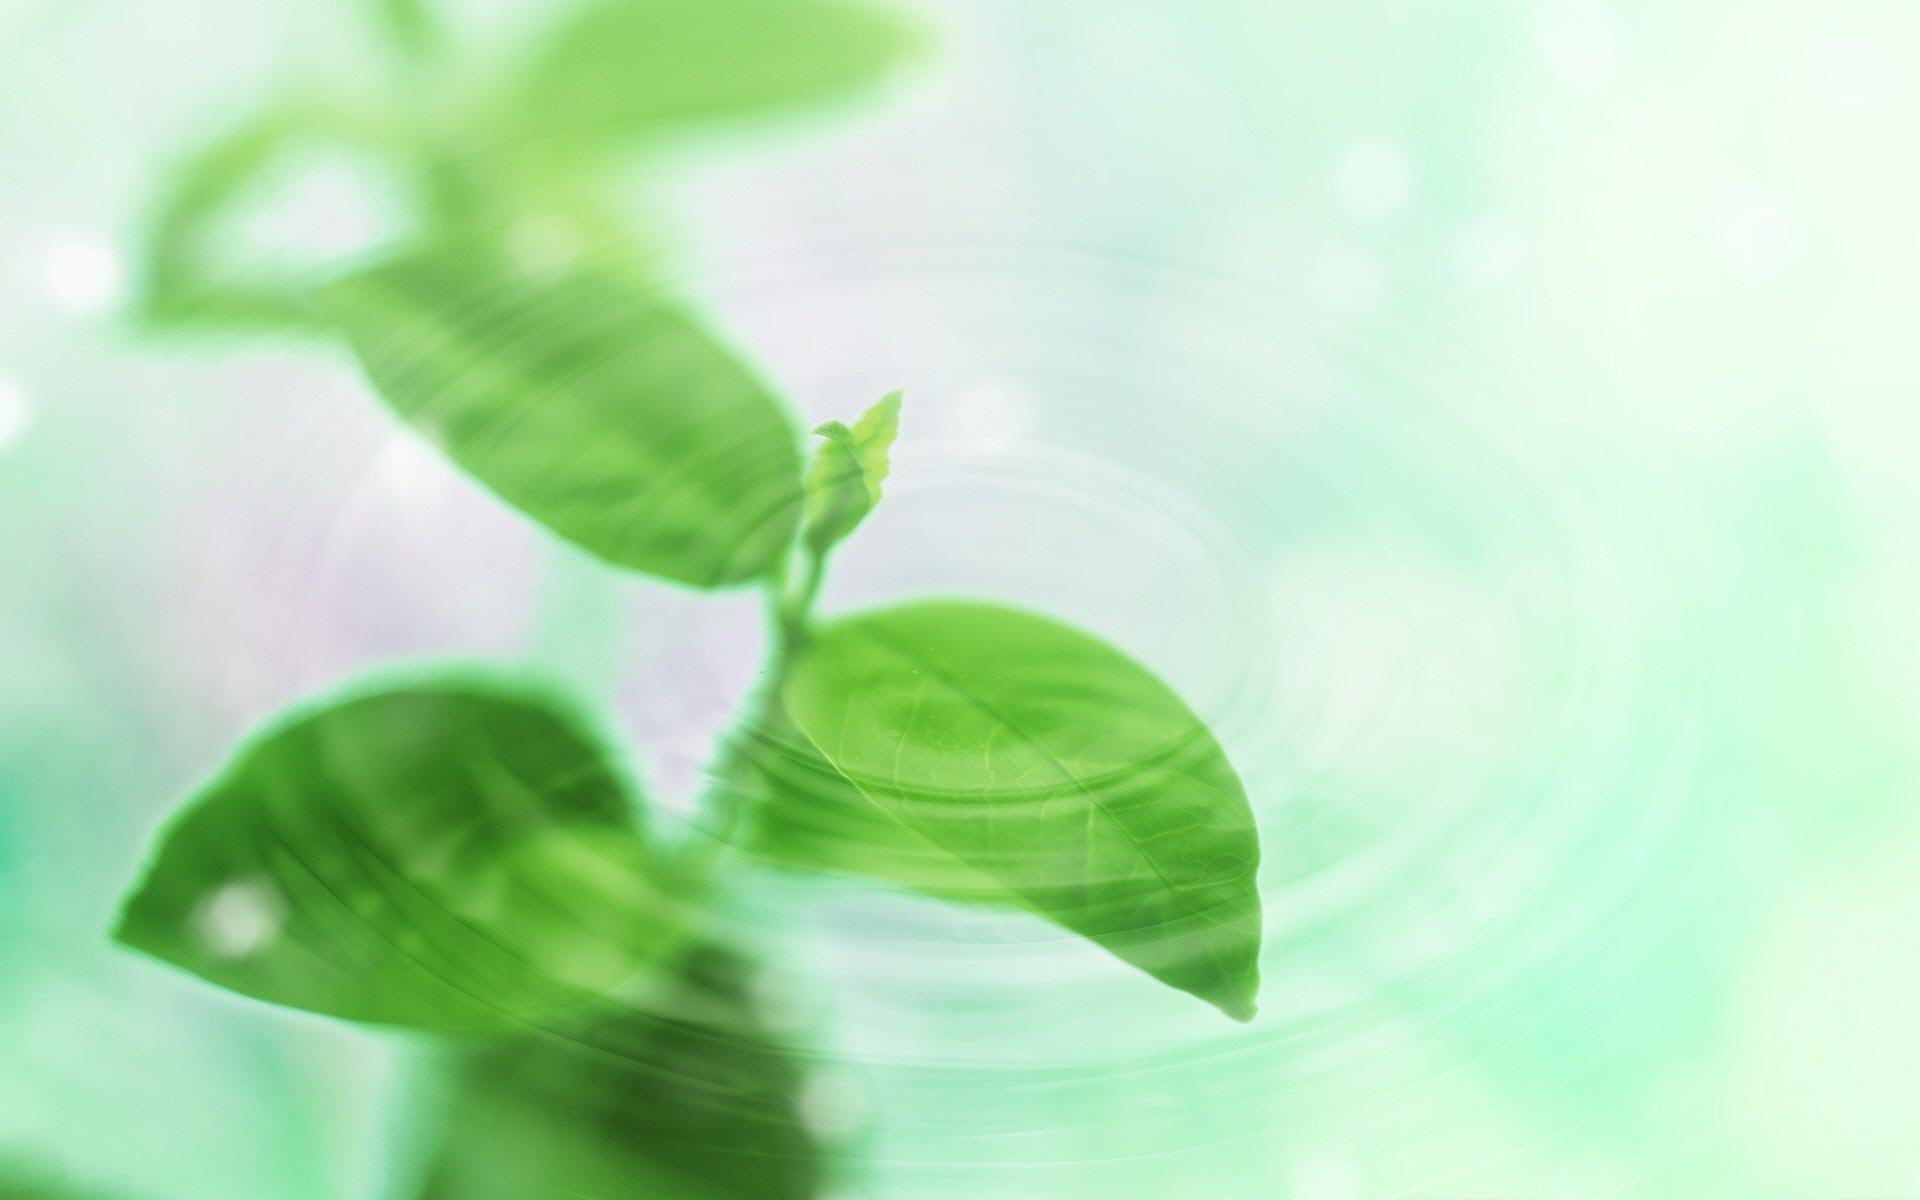 ppt 背景 壁纸 电脑桌面 发芽 绿色 绿色植物 绿叶 嫩芽 嫩叶 树叶 新